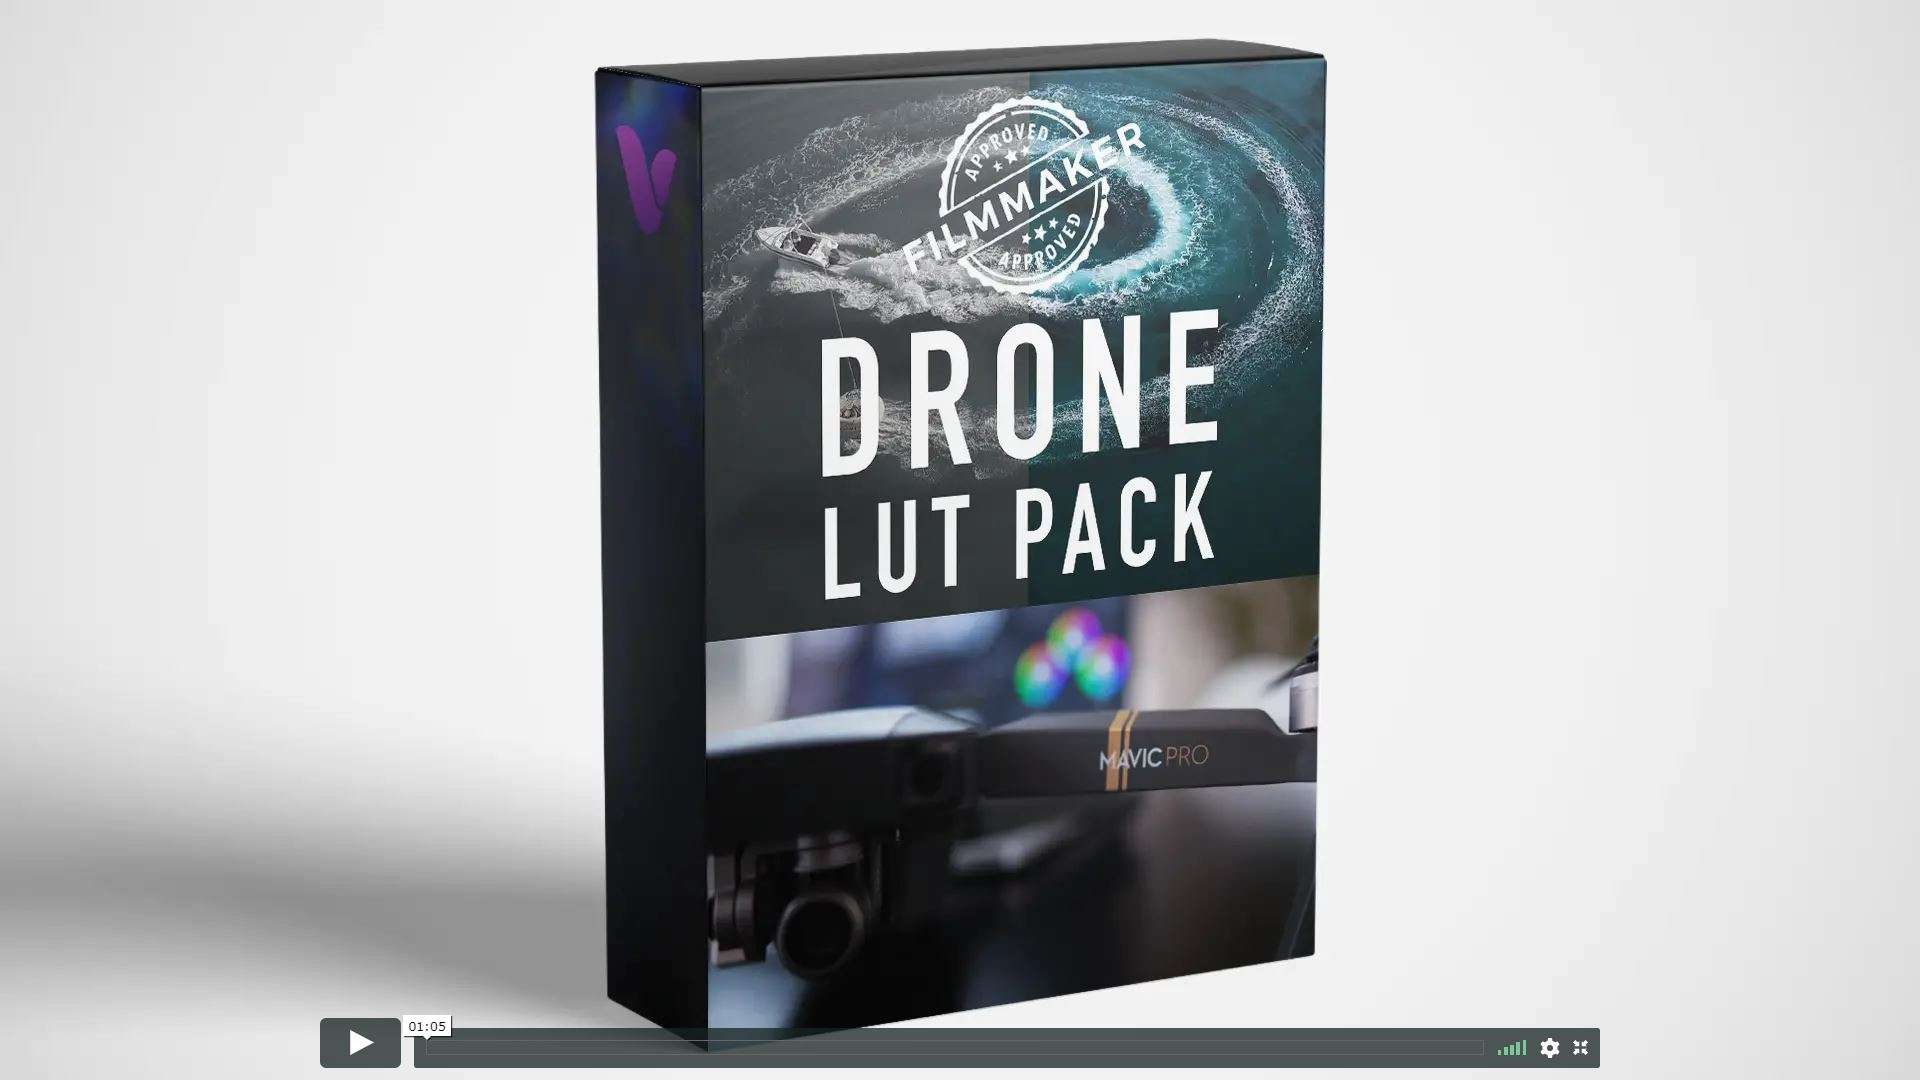 Vamify – Drone Luts – (Flycam) LUTs (Win/Mac) - LUTS MÀU ĐẸP